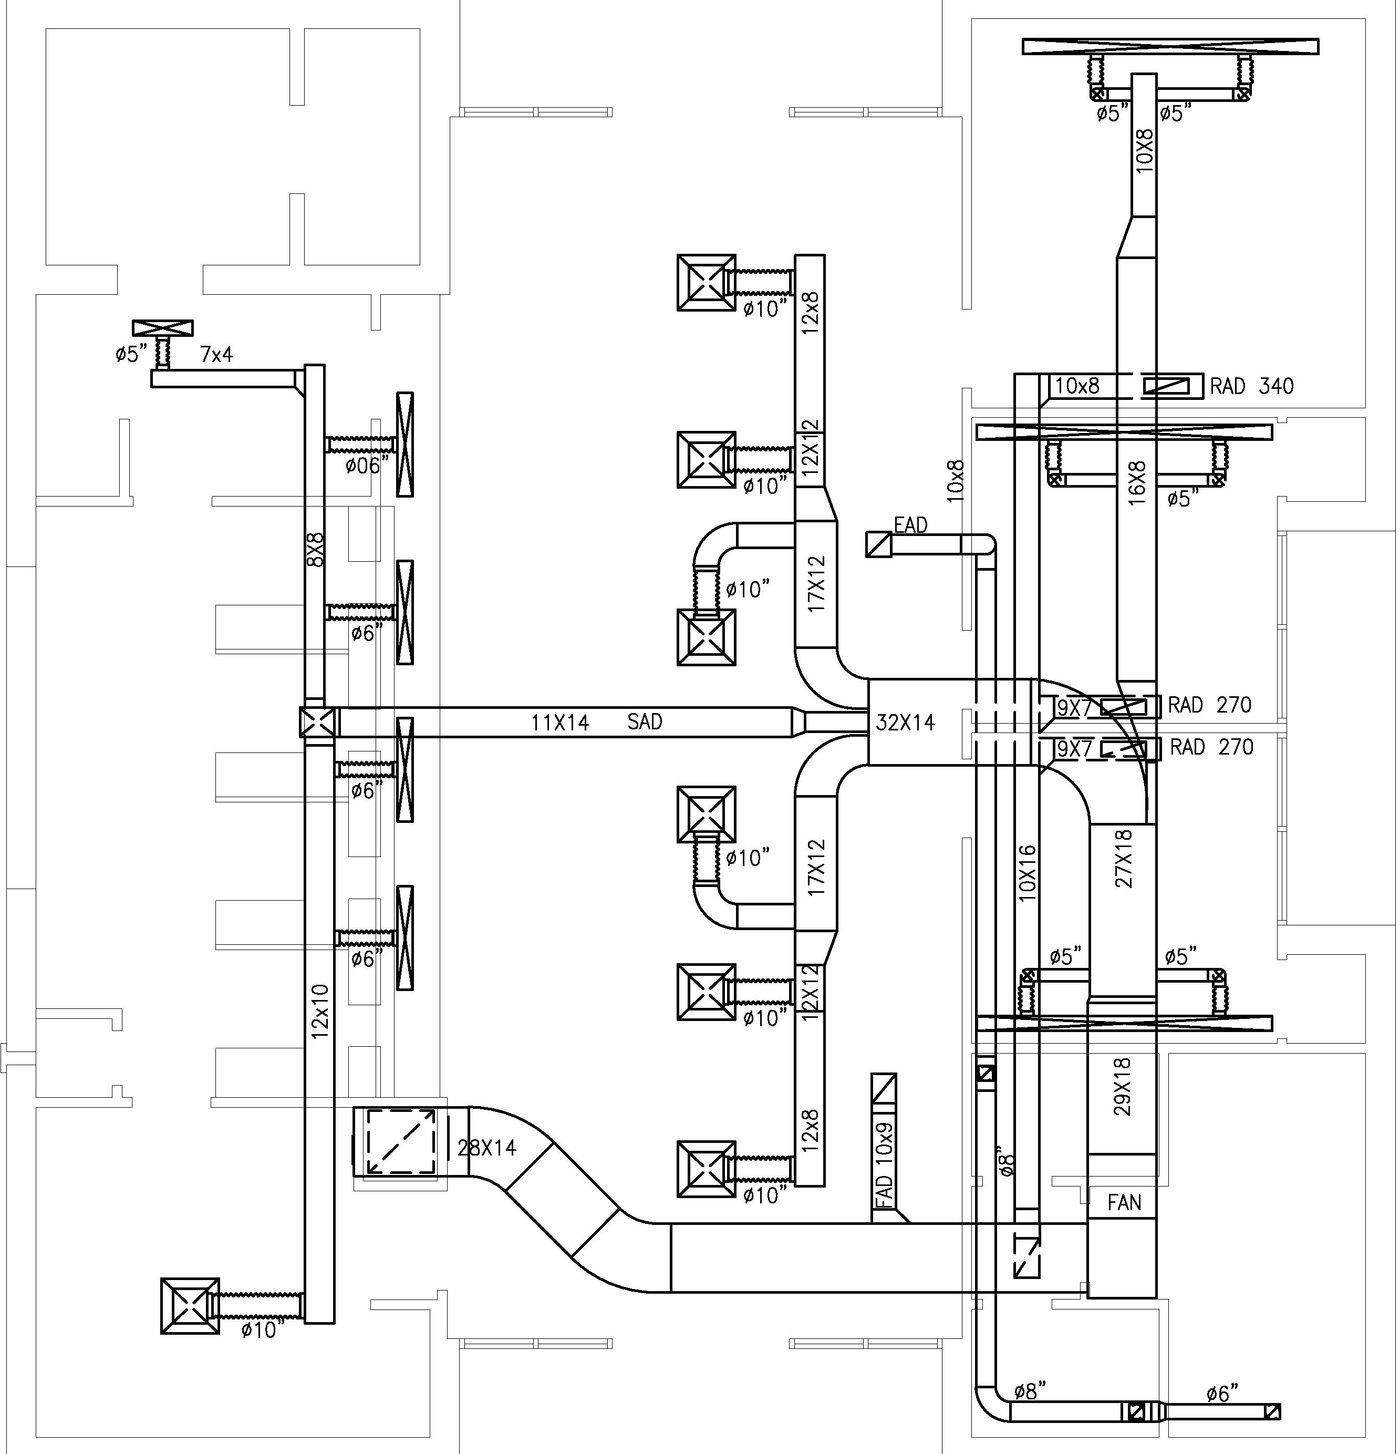 Hvac Plans By Raymond Alberga At Drawing